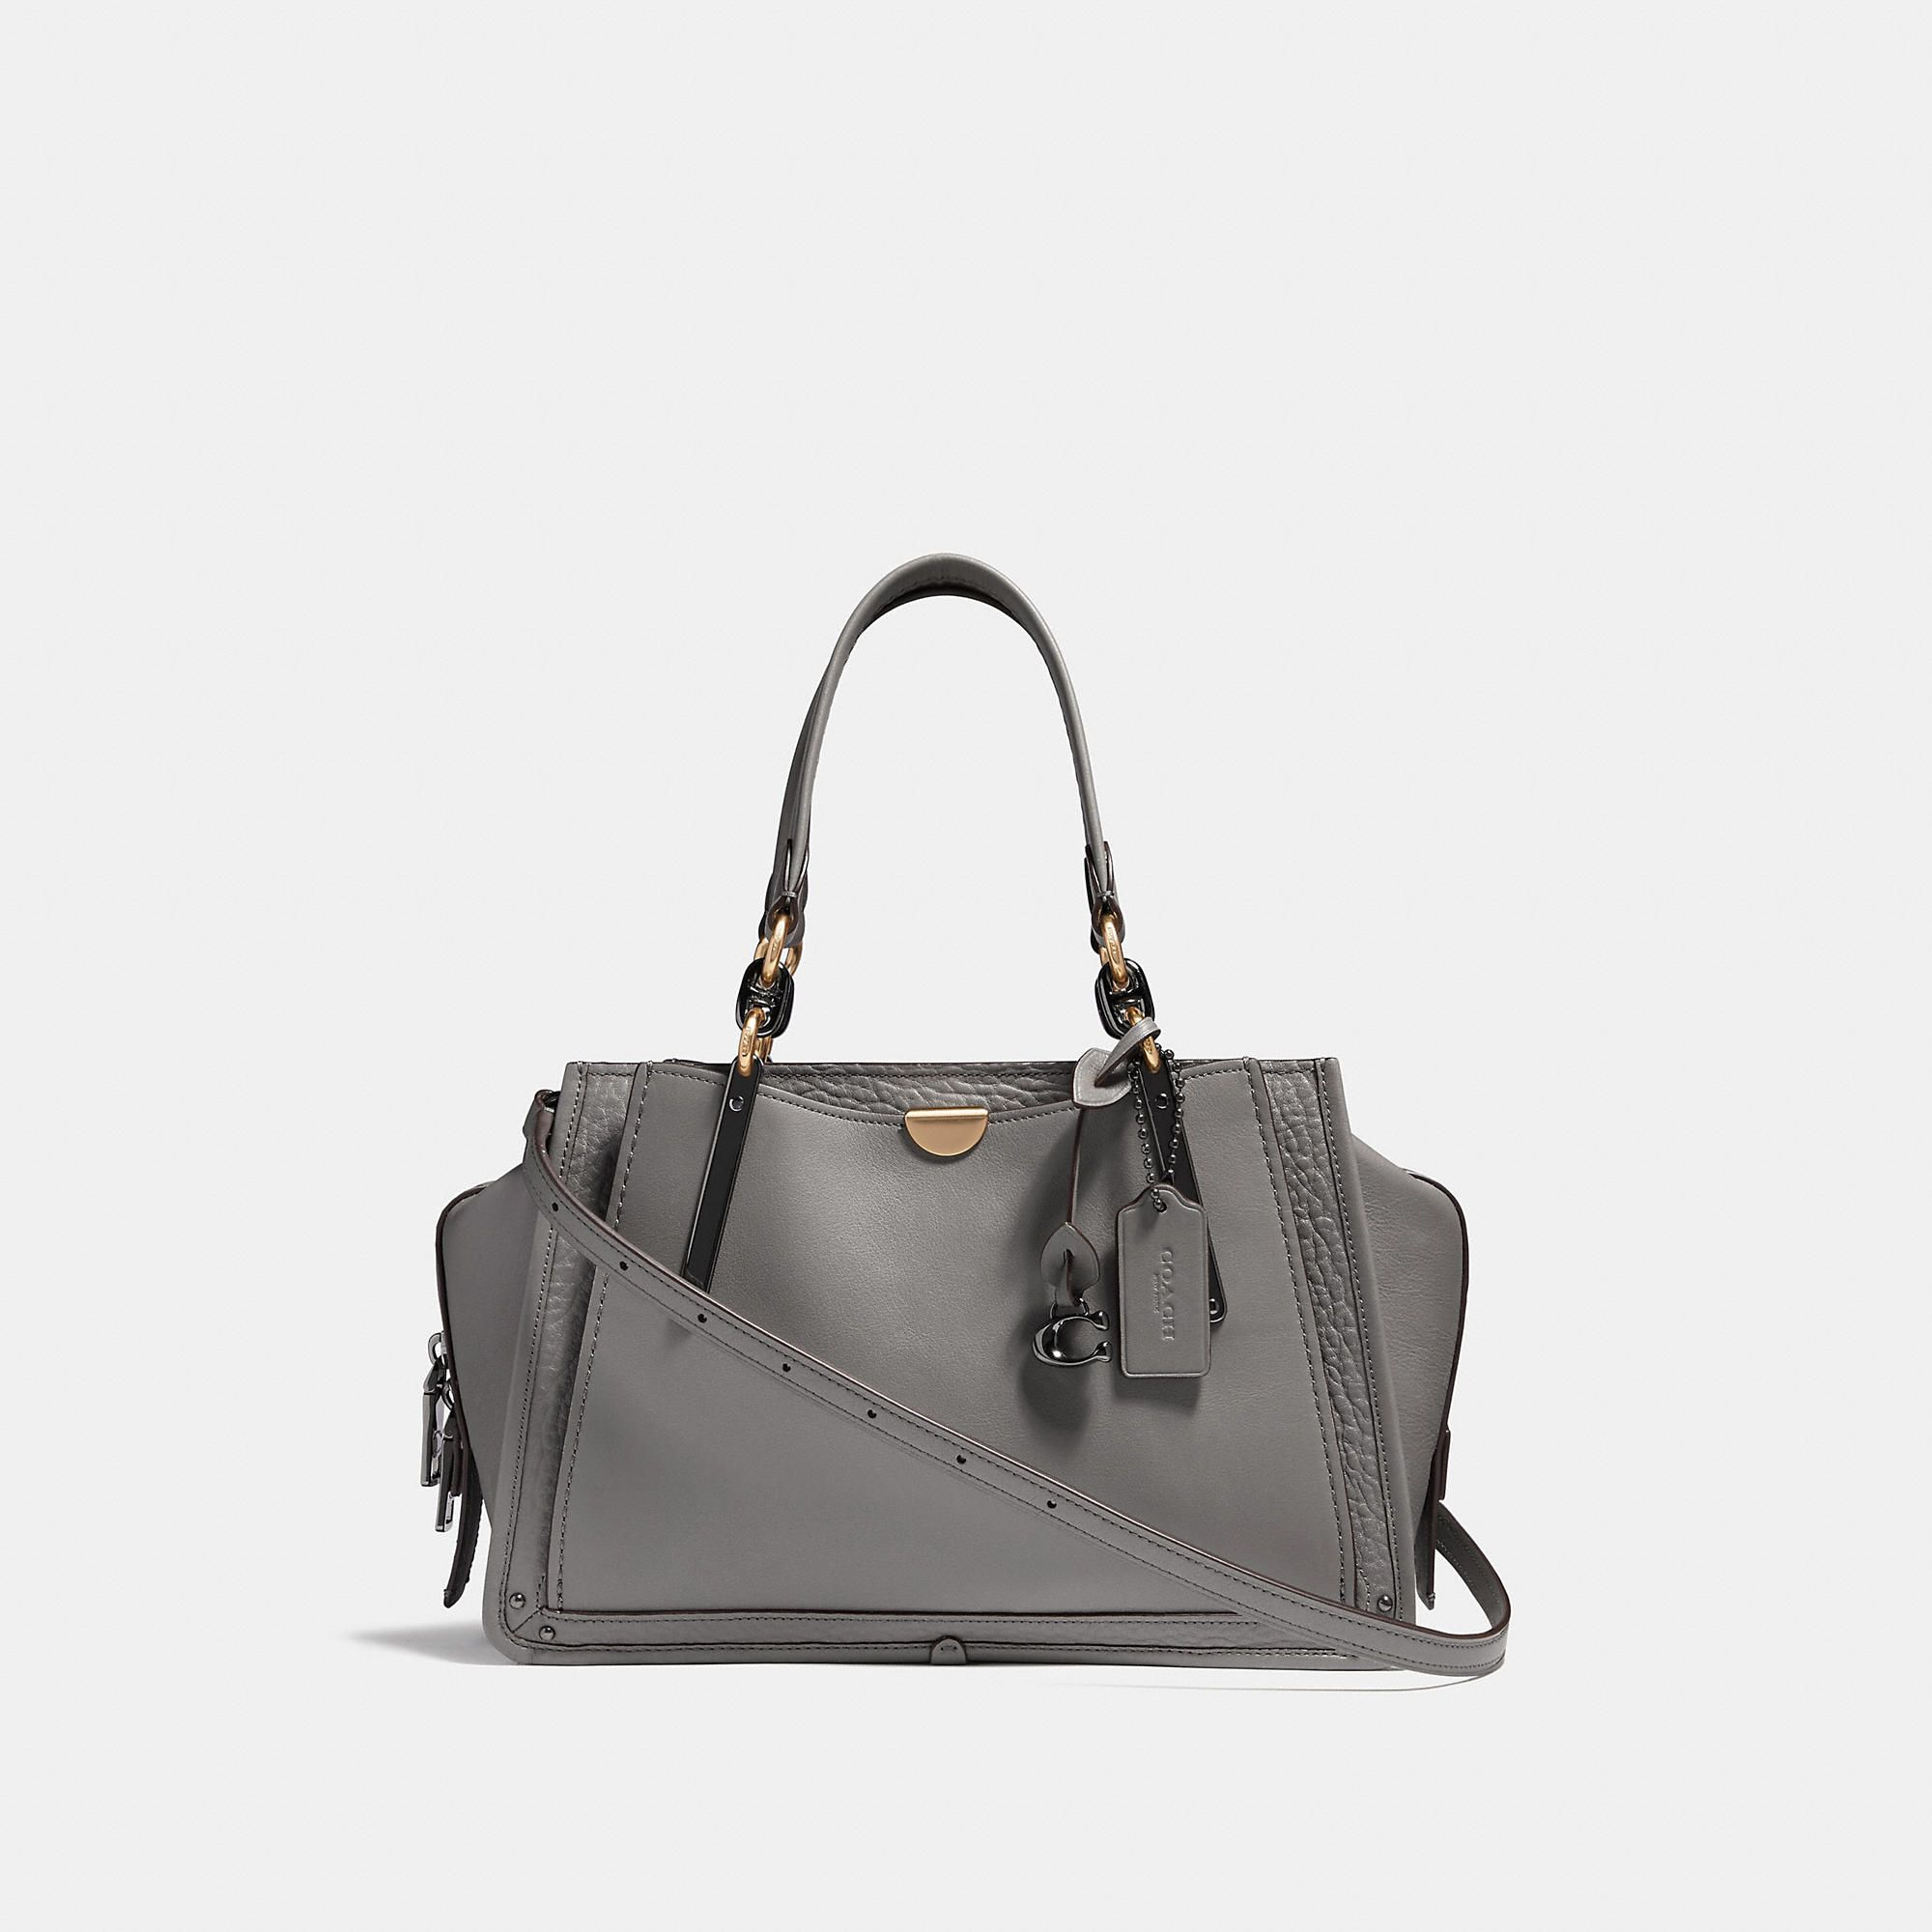 8a132593 COACH Dreamer - Women's Designer Handbags | Products | Bags, Coach ...